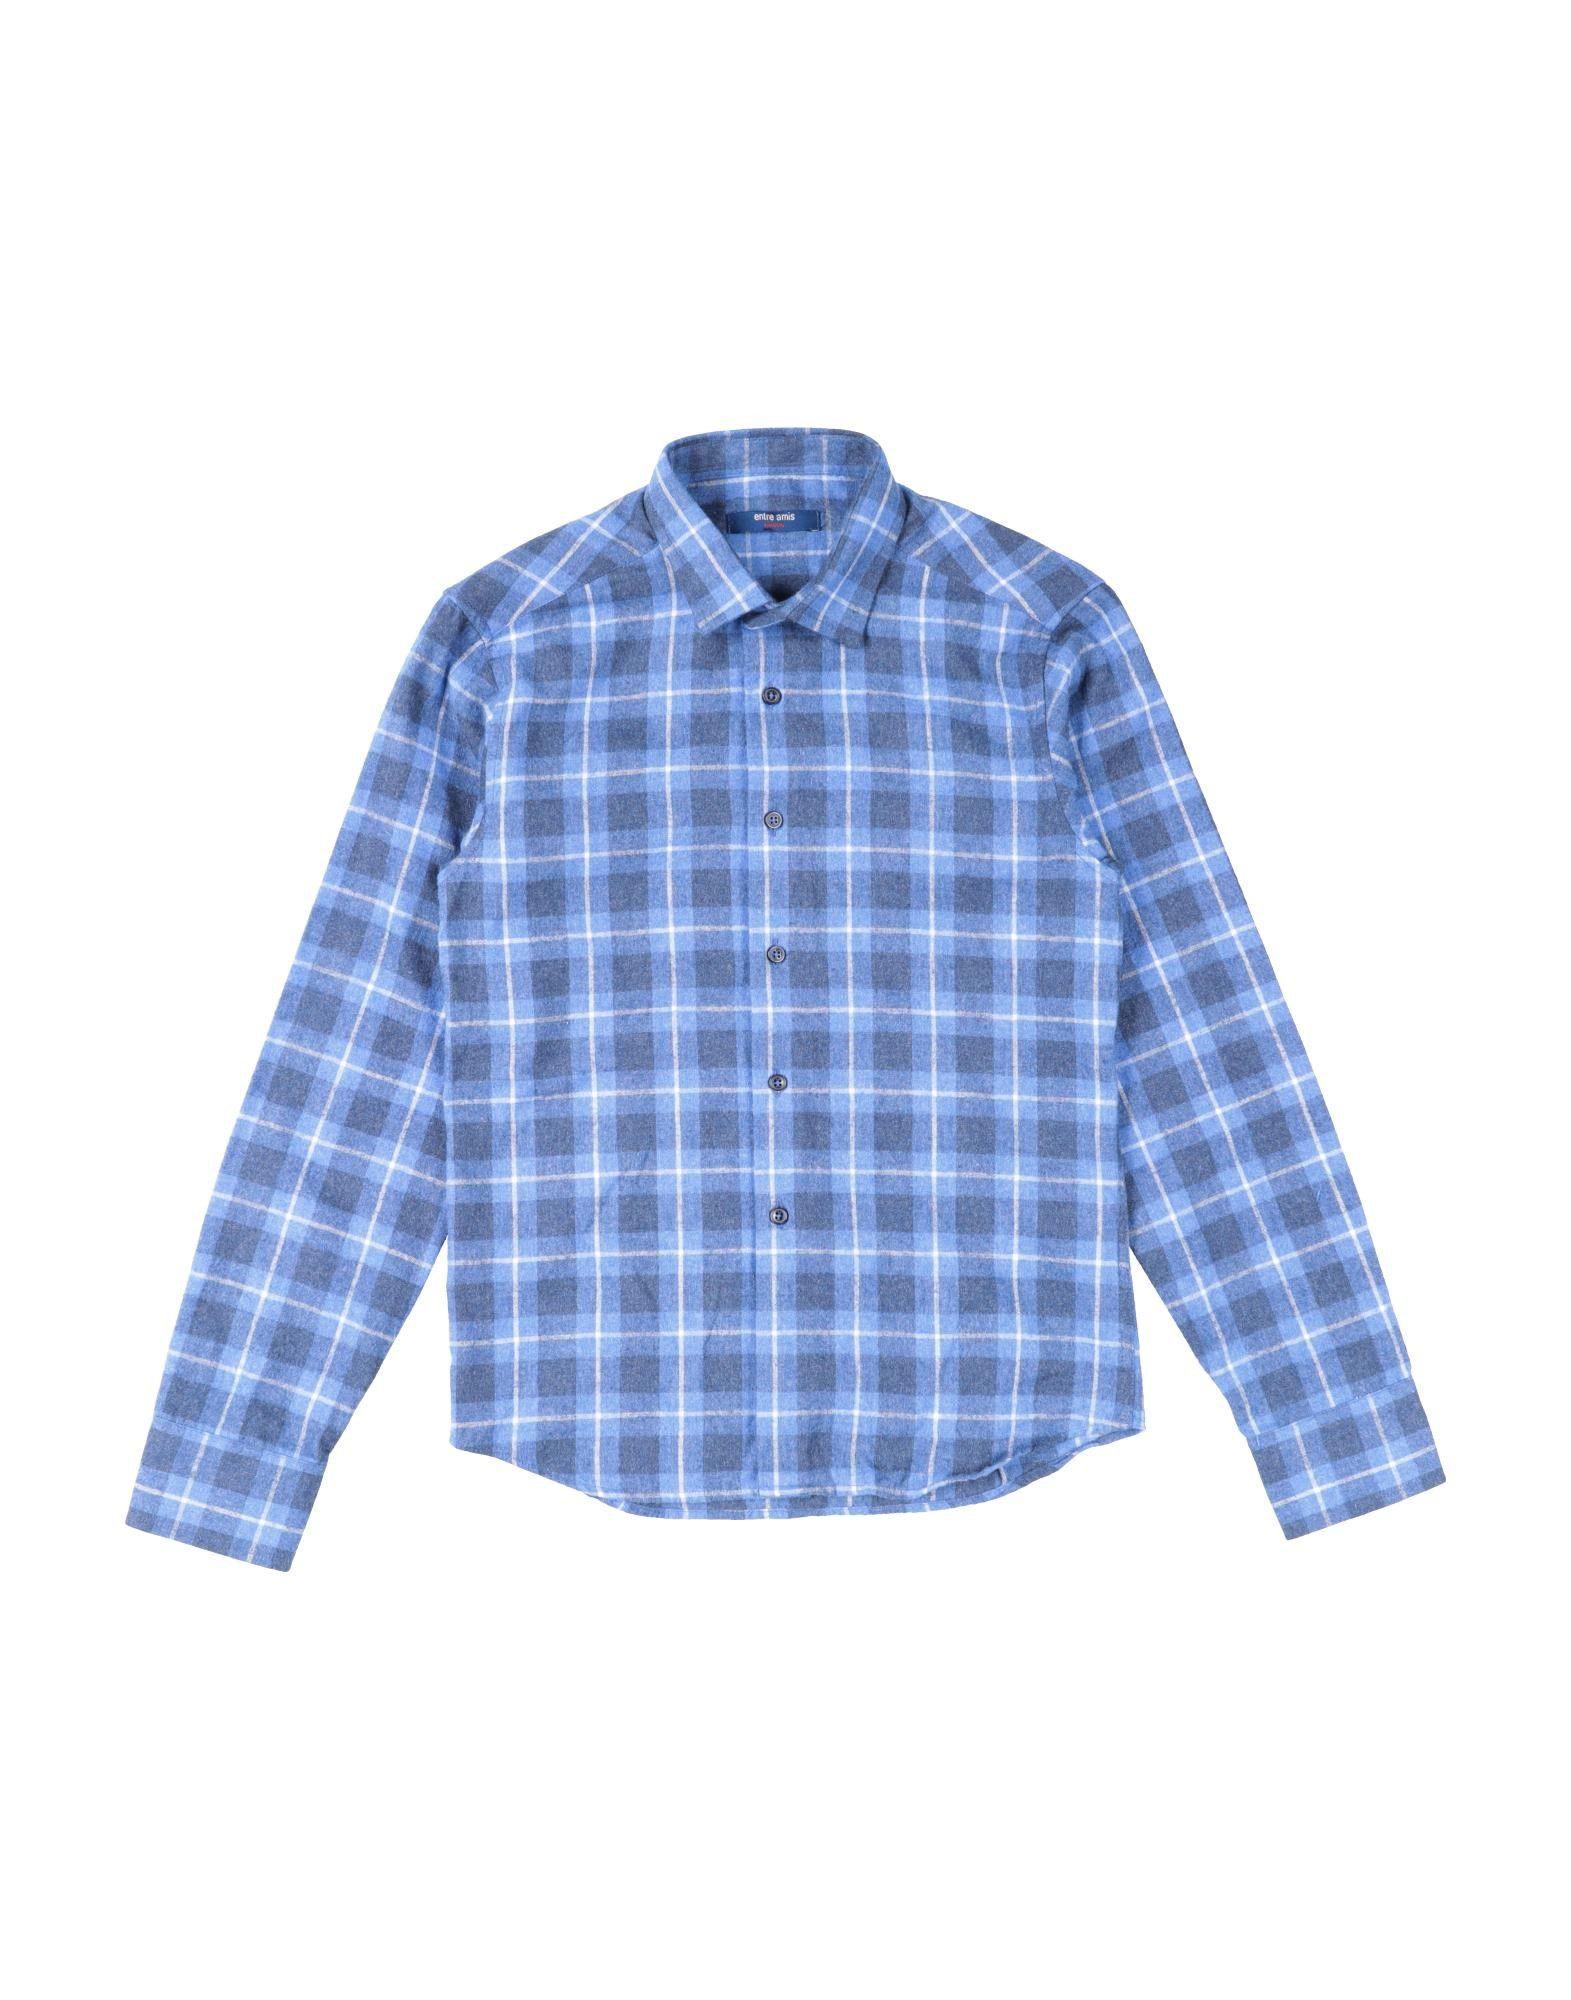 Entre Amis Garçon Kids' Shirts In Blue